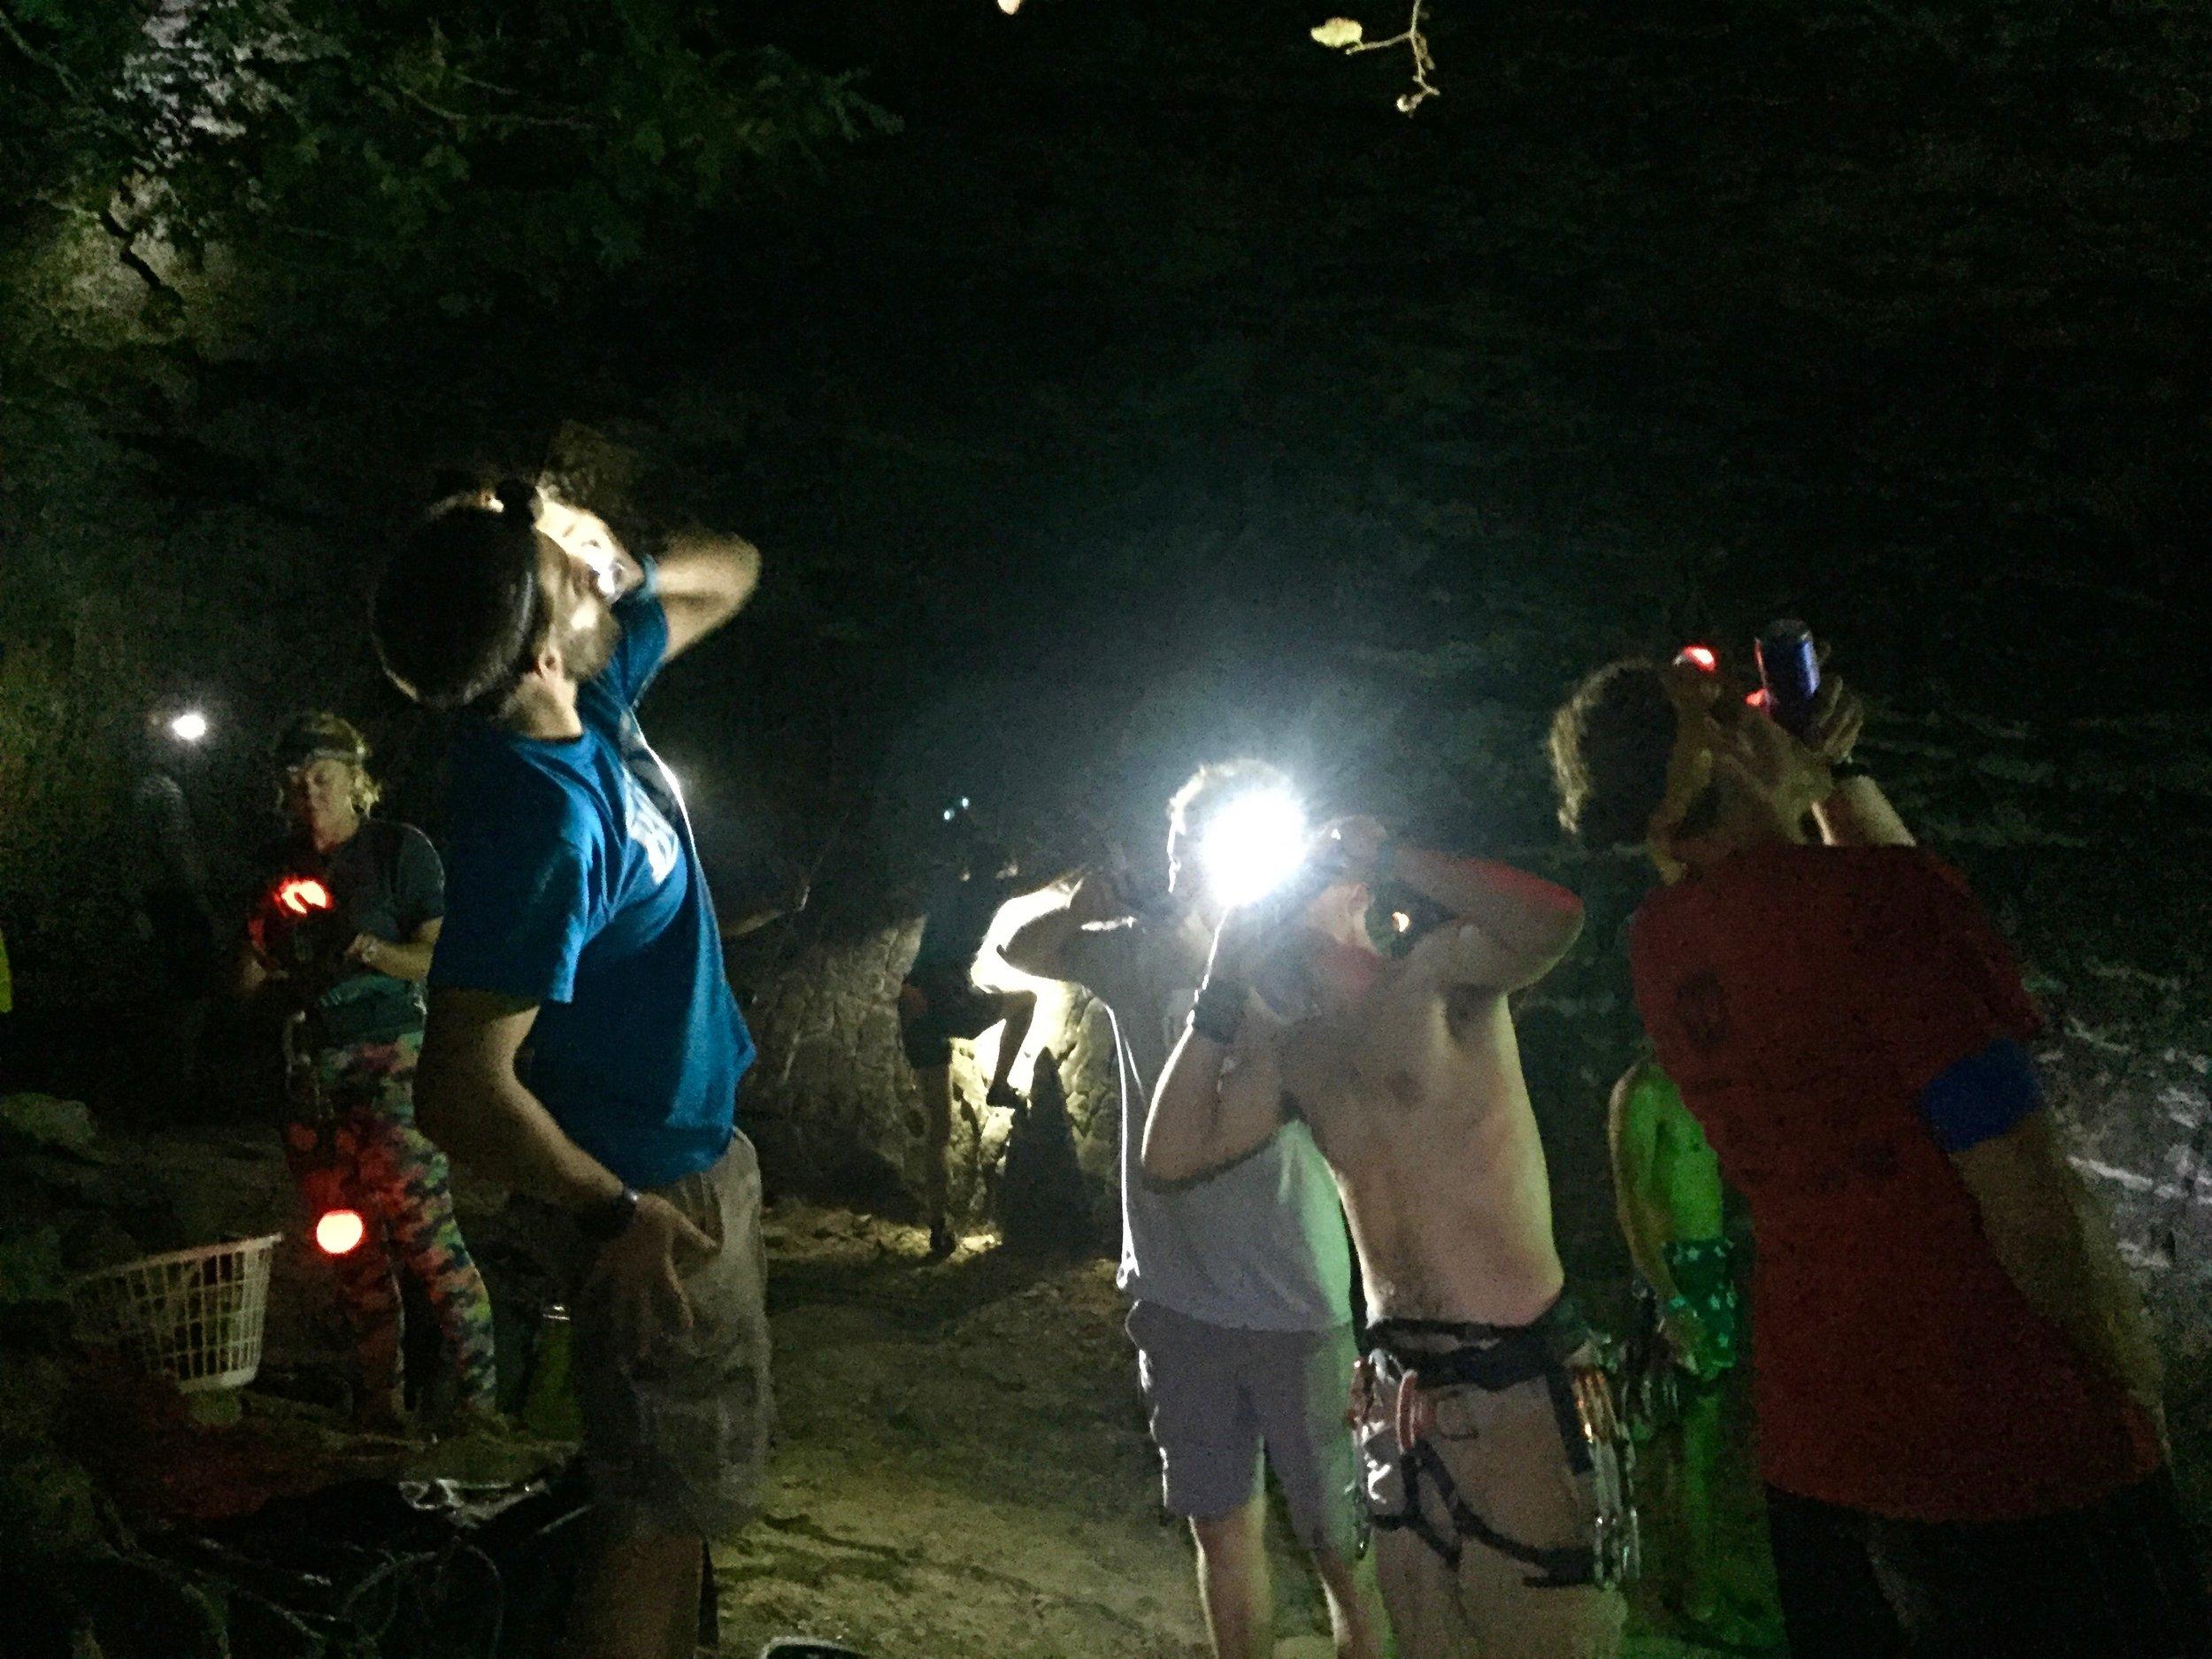 Shotgunning beers at midnight